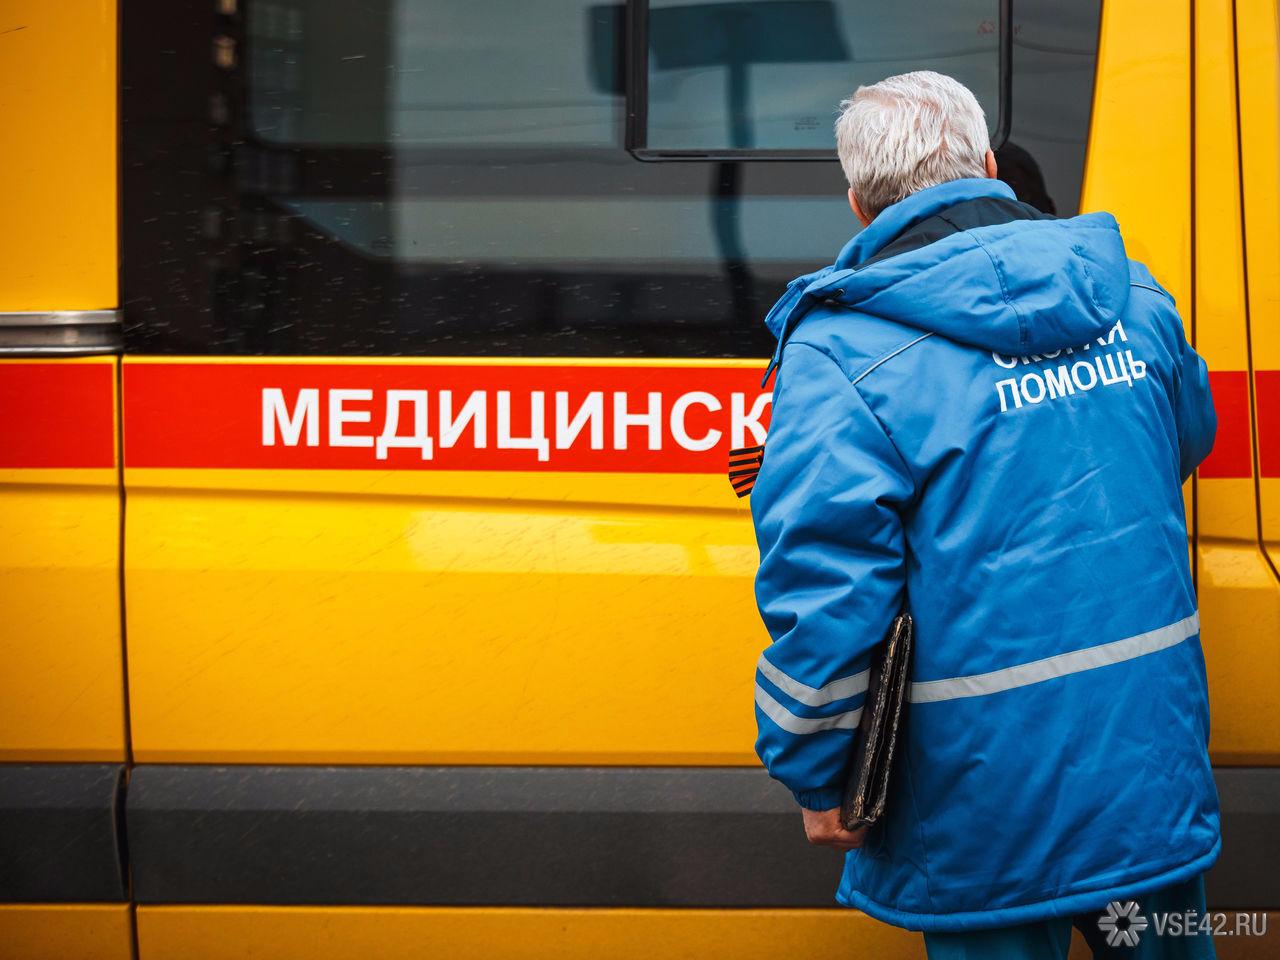 Вцентре Томска вмаршрутке скончался пенсионер